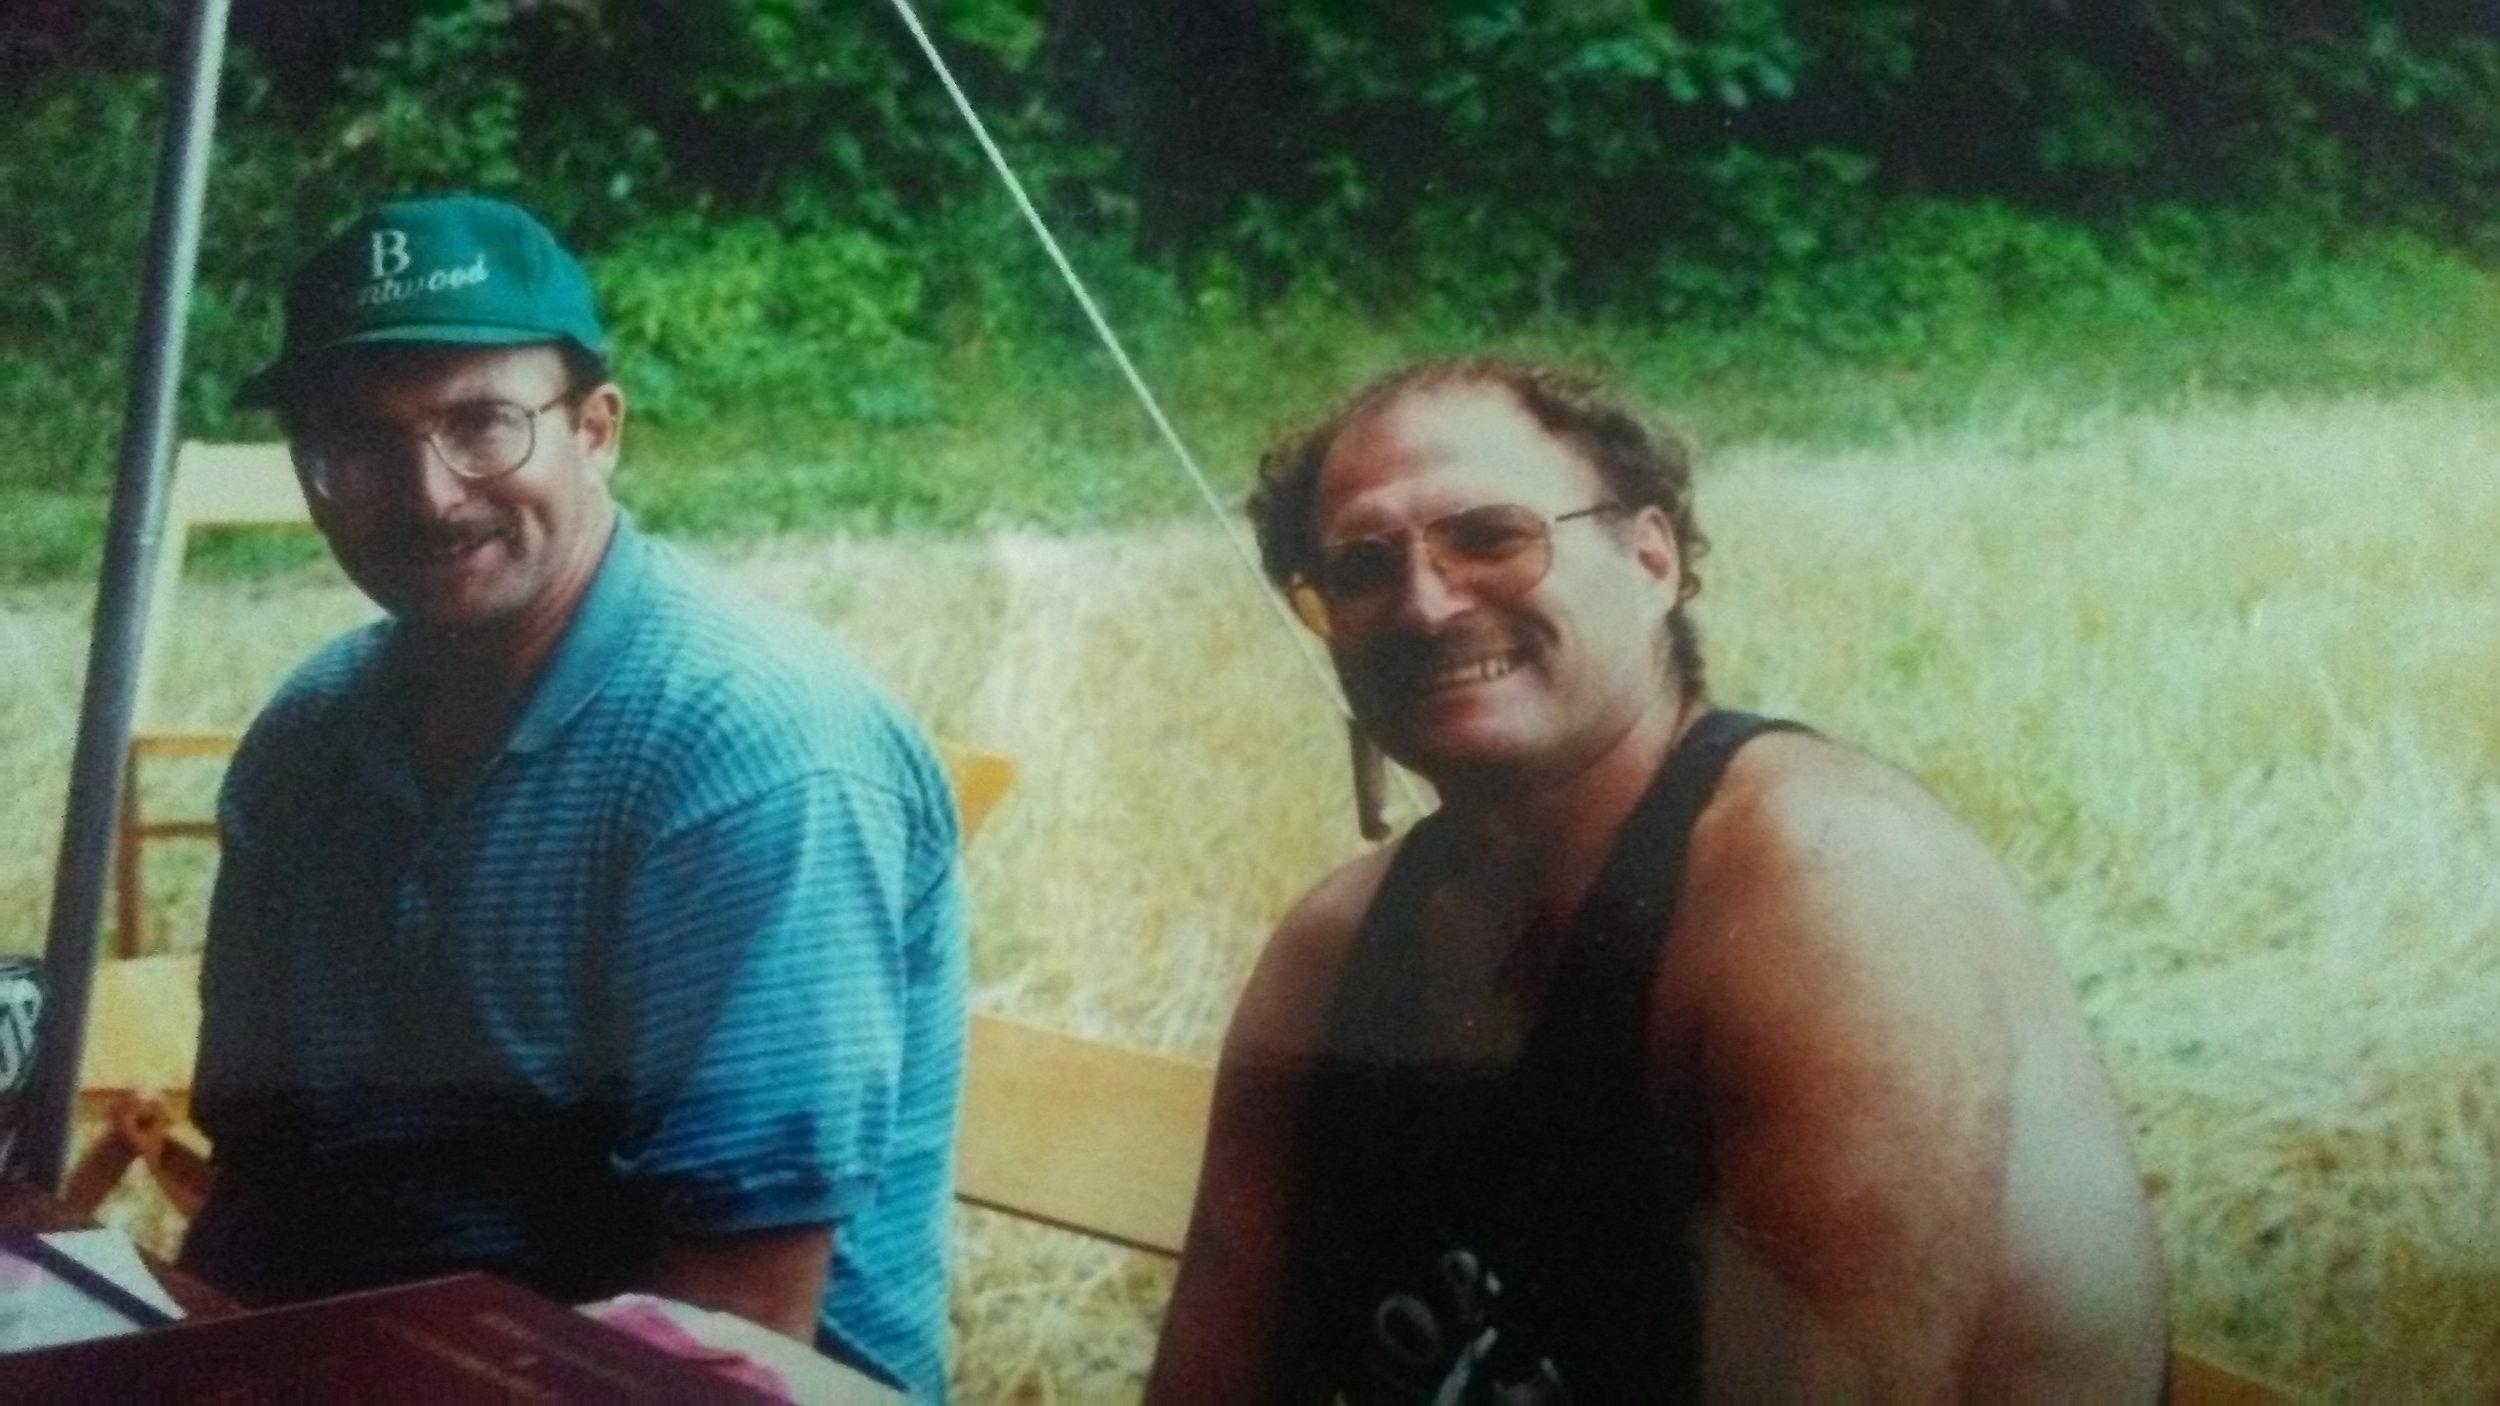 Brian and Dave Ebosh